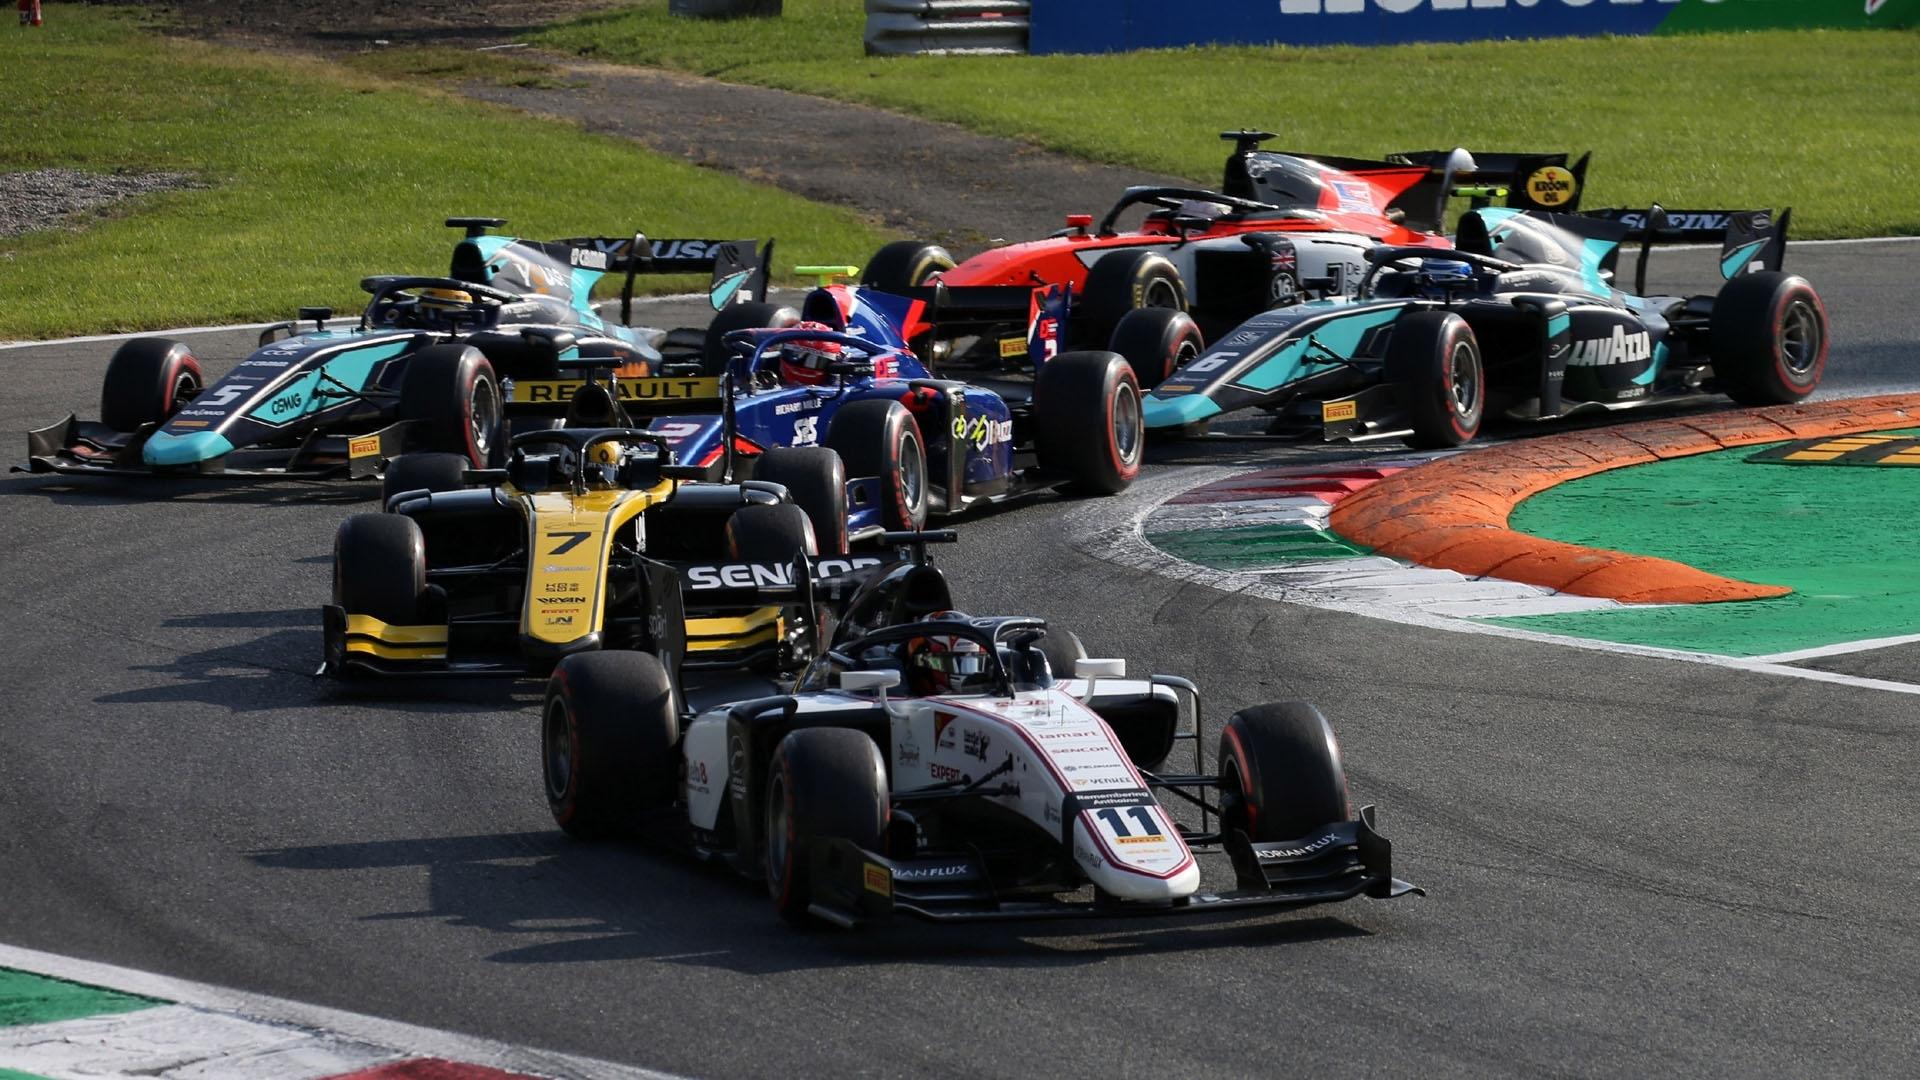 2020 Calendars Confirmed For Formula 2 And Formula 3